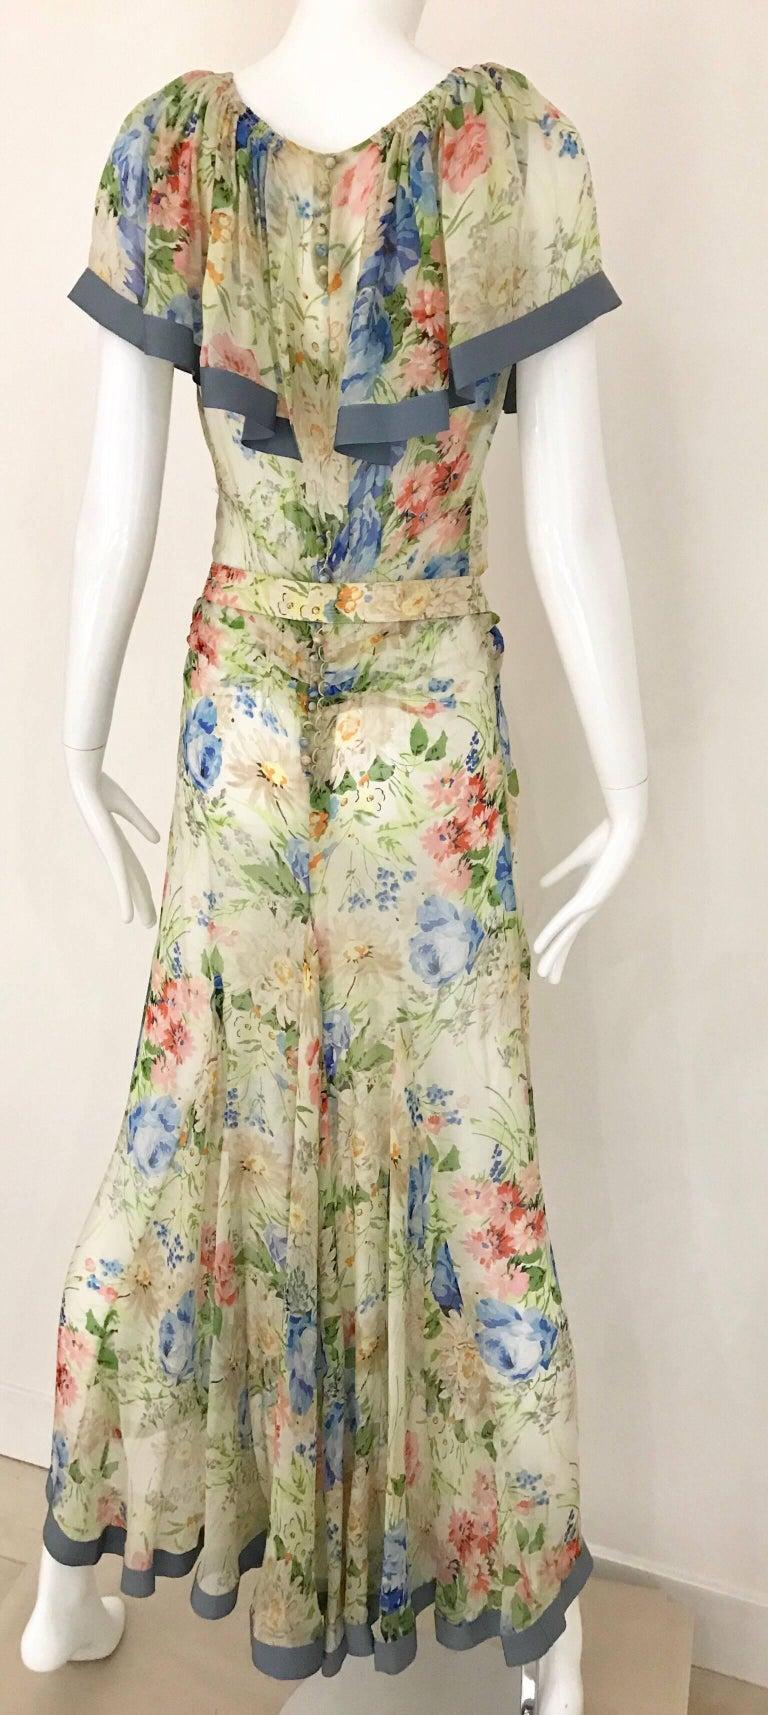 Beige 1930s Floral Print Silk Dress For Sale